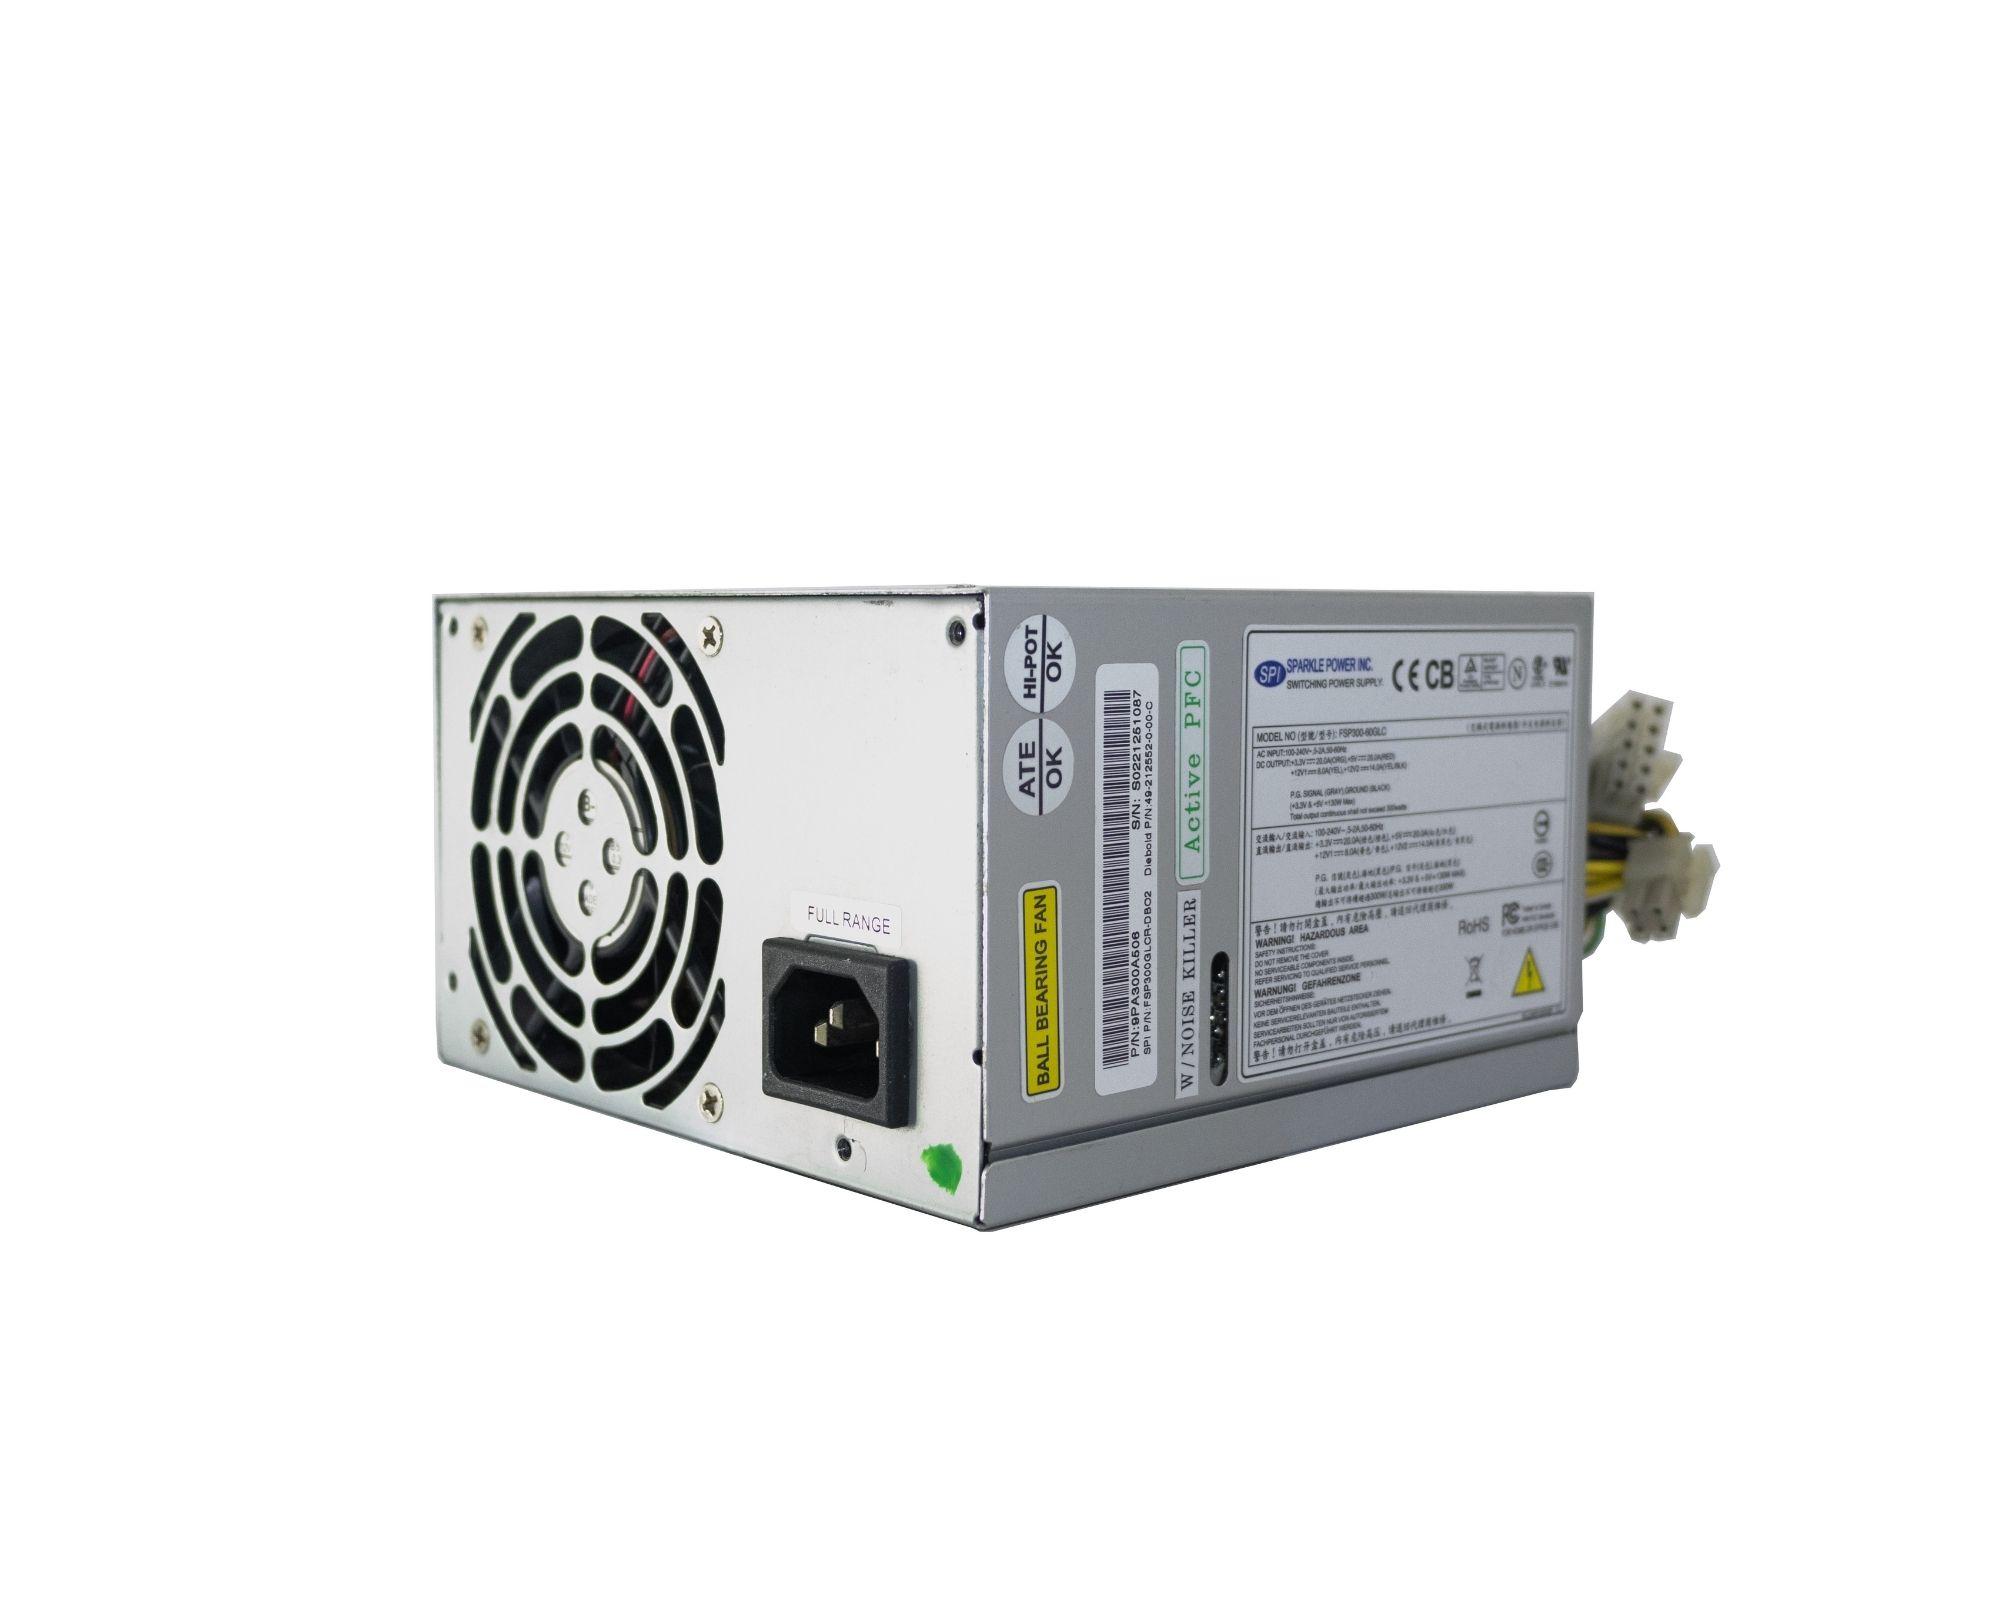 Fonte Para Lenovo Thinkserver Sparkle FSP300-60GLC 10 Pinos 300W 54y8934